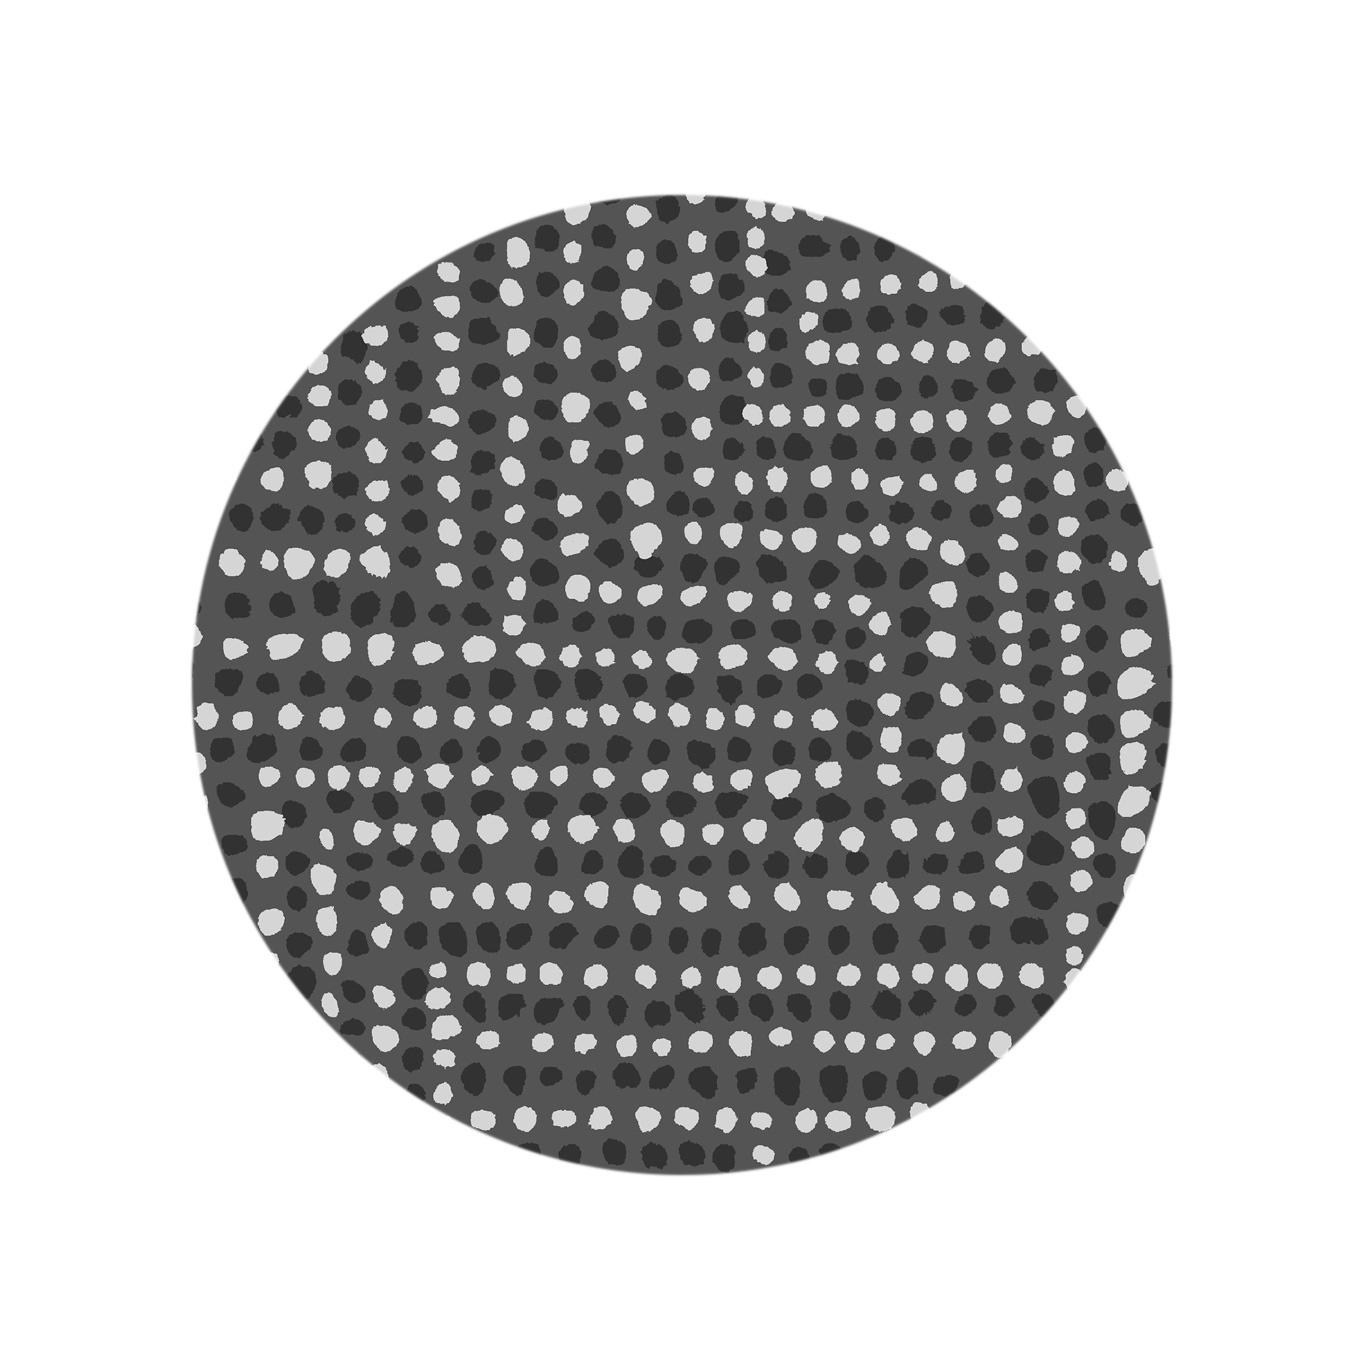 Traveling Dot - Black